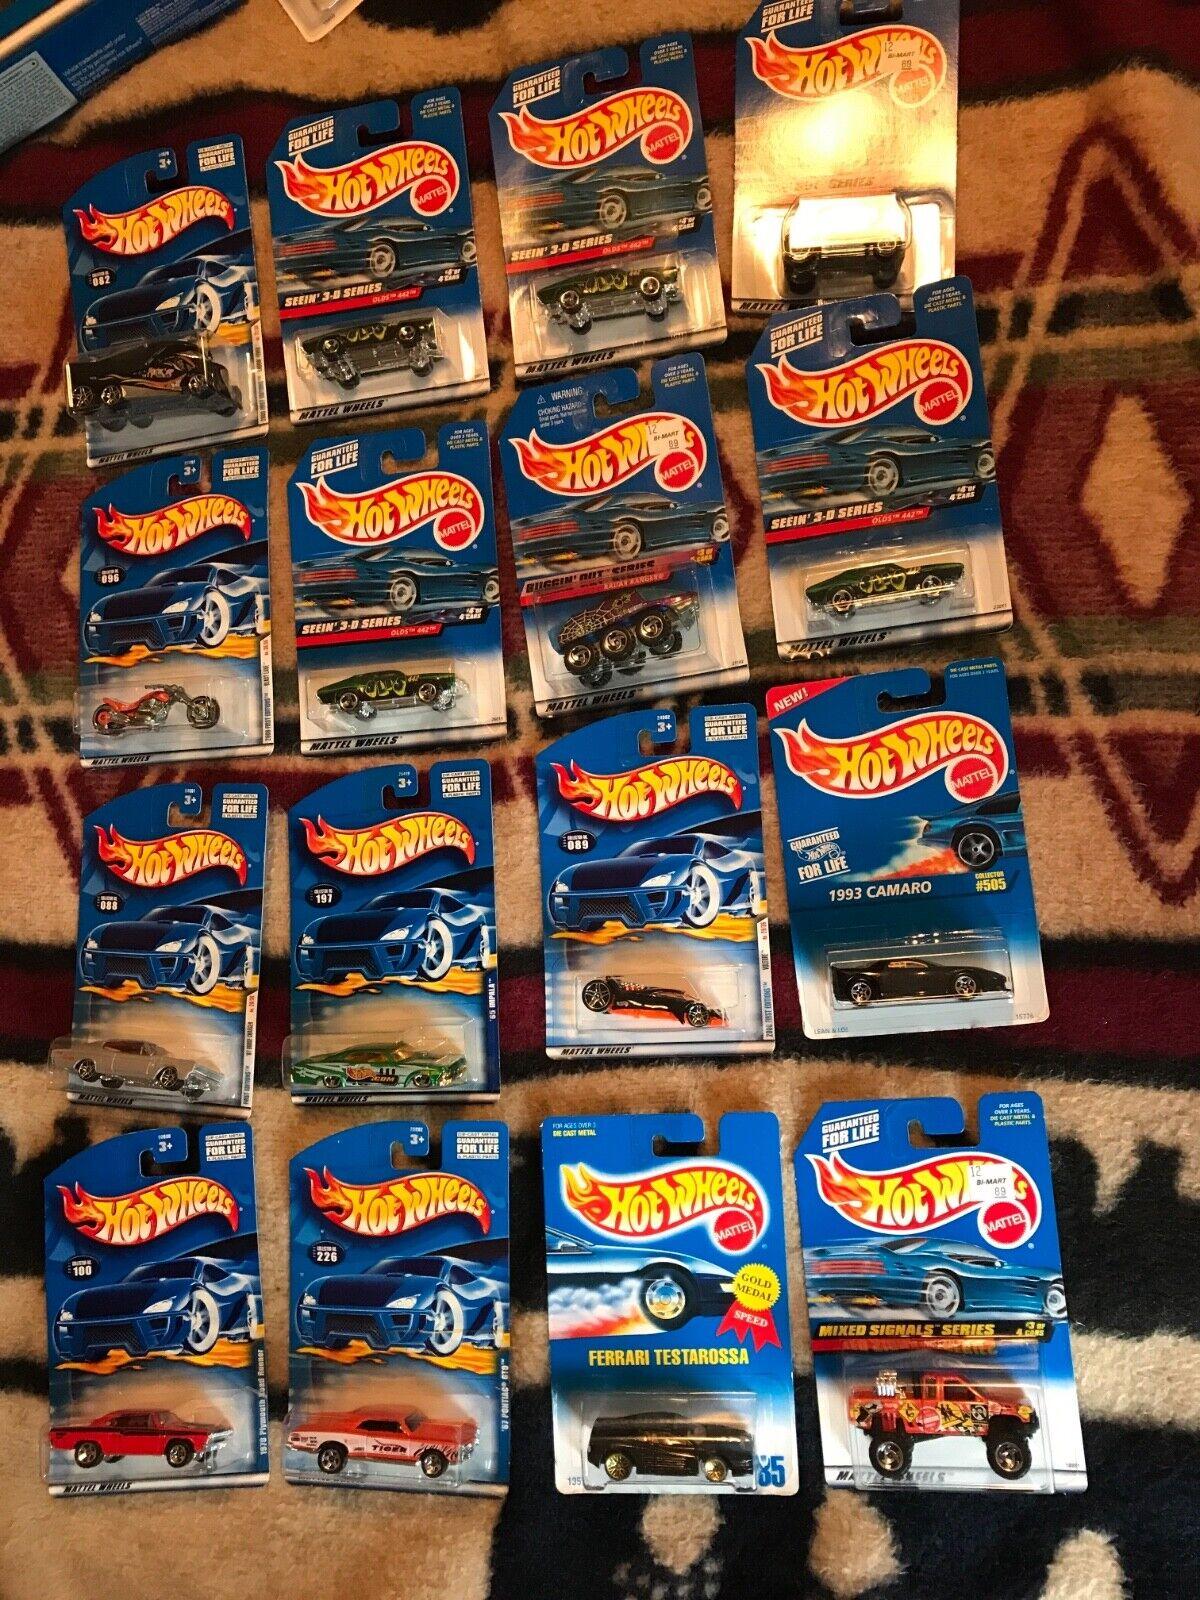 MATTEL HOT WHEELS CARS LOT OF 64 1995 TO 2001 new matchbox